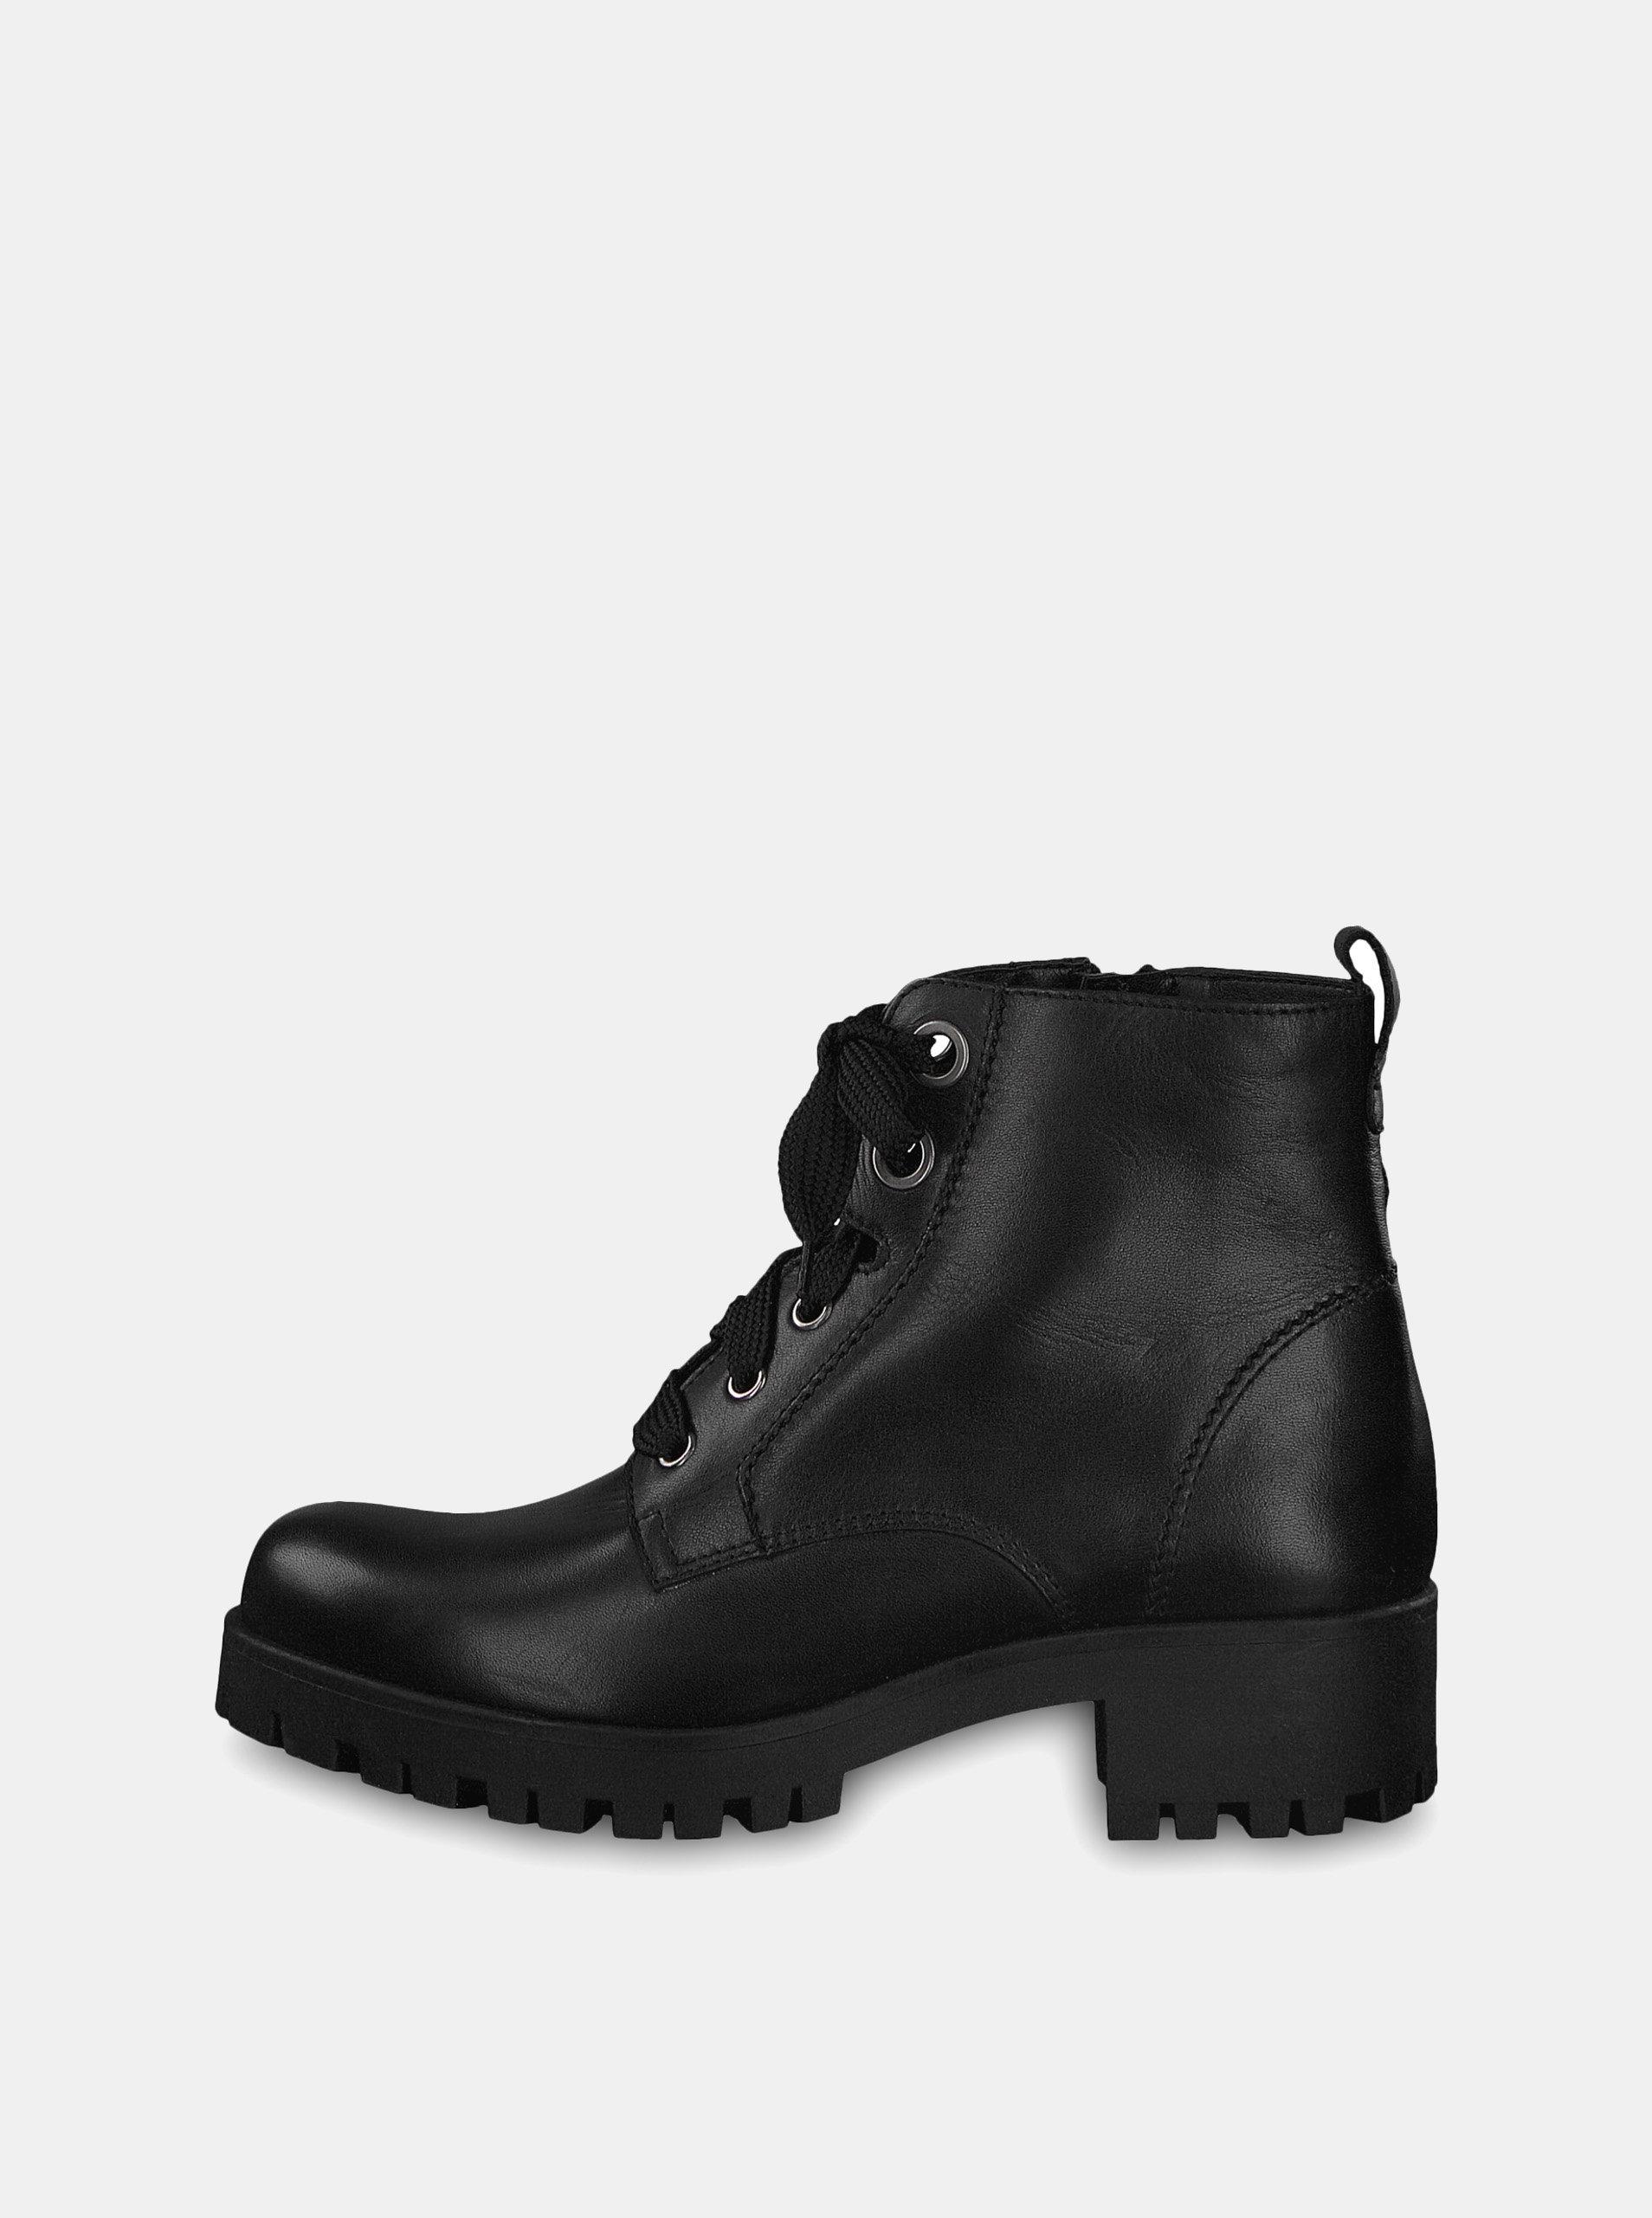 Černé kožené kotníkové boty Tamaris ... e7d531a2e6